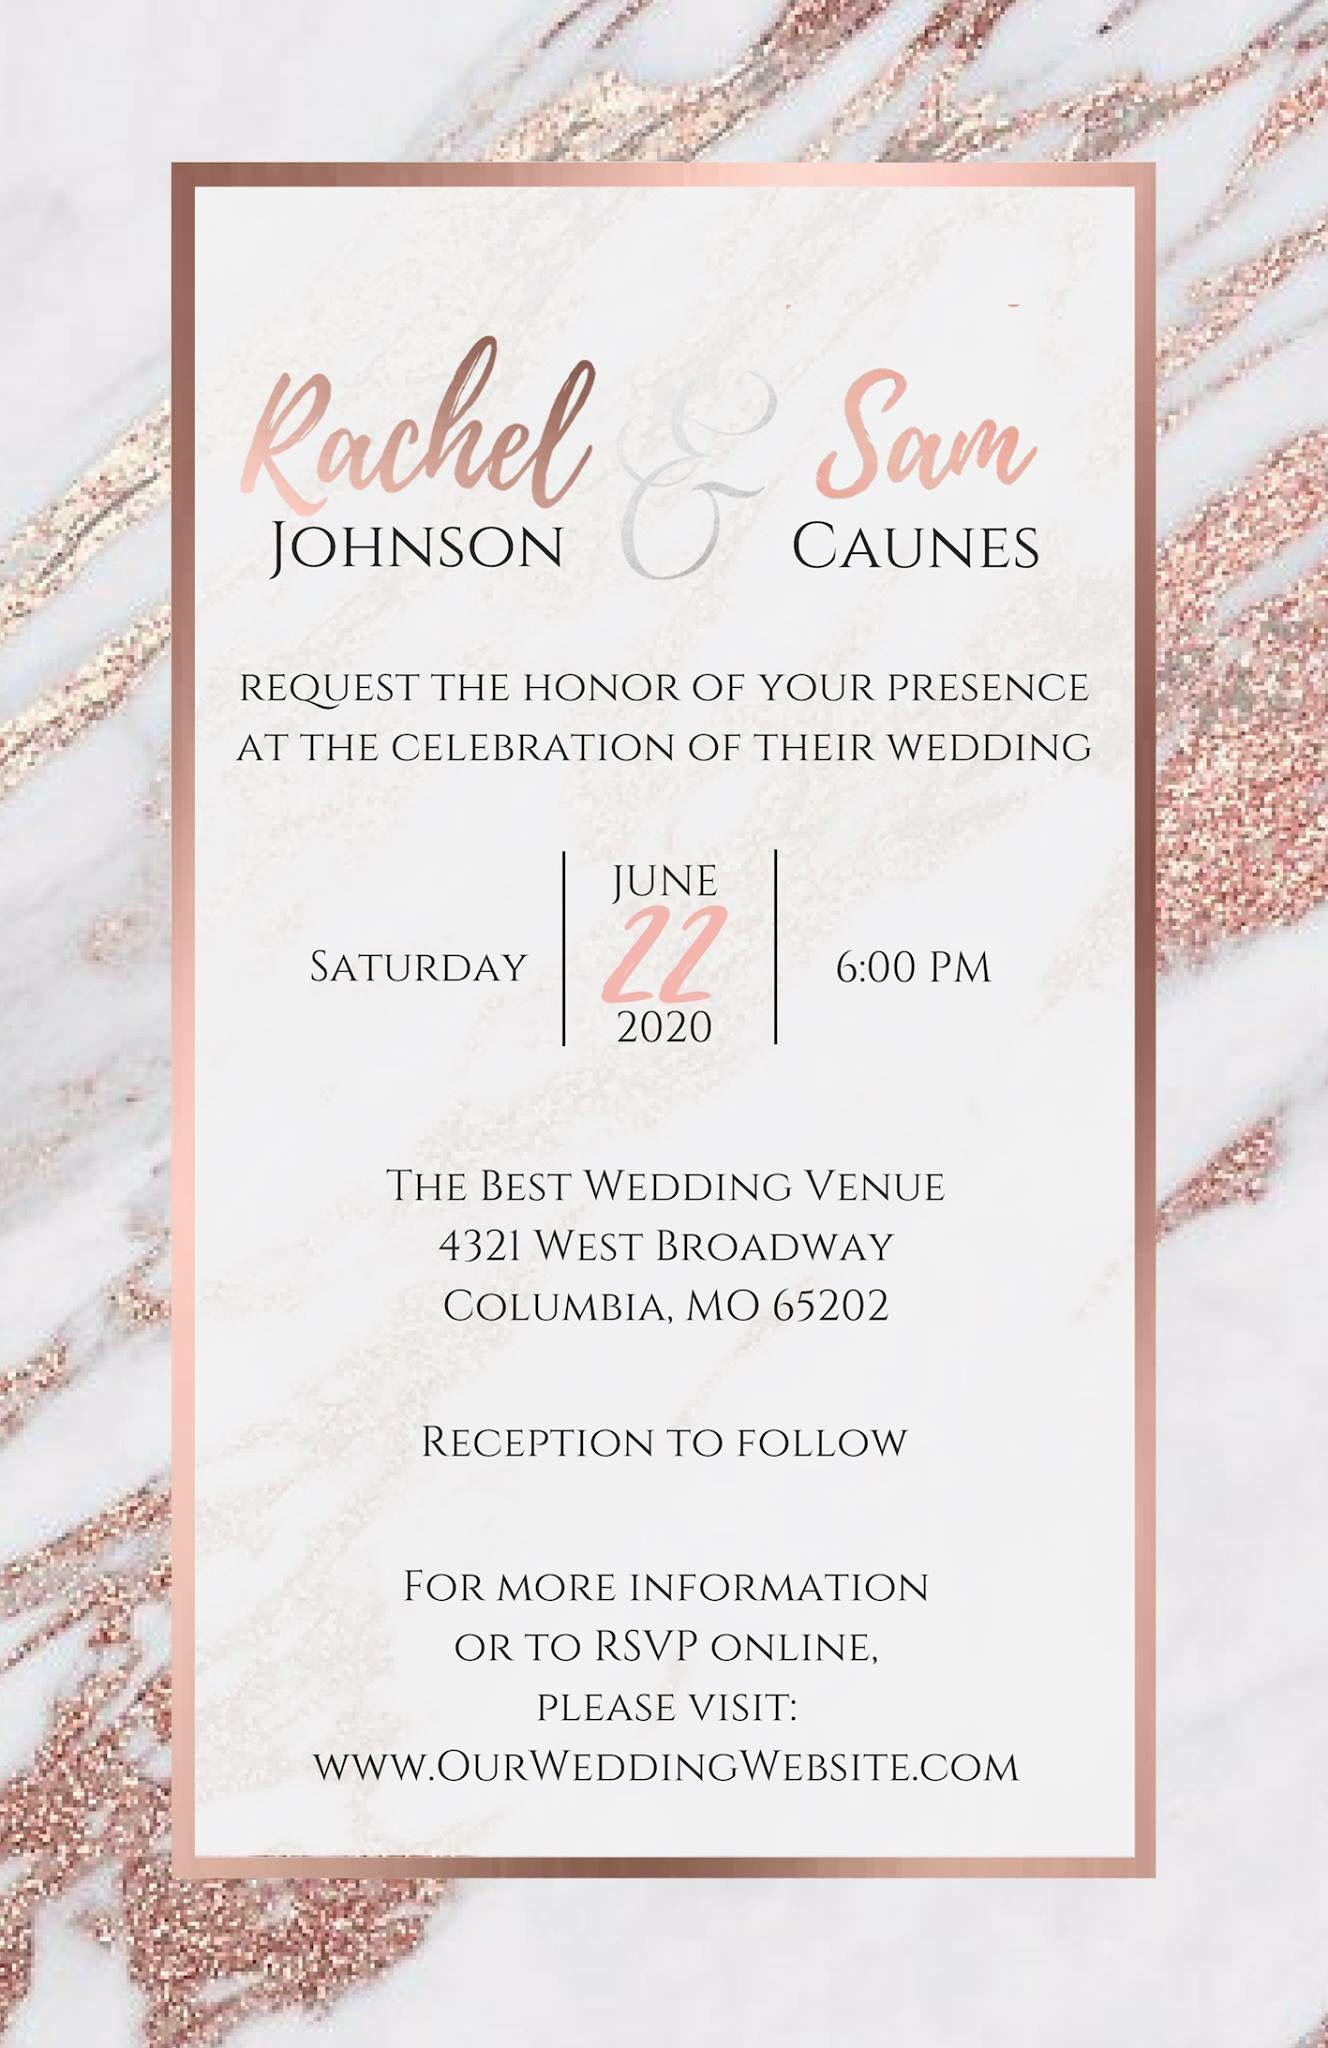 Layout Partecipazioni Matrimonio.Rose Gold Marble Elegant Wedding Invitations With Images